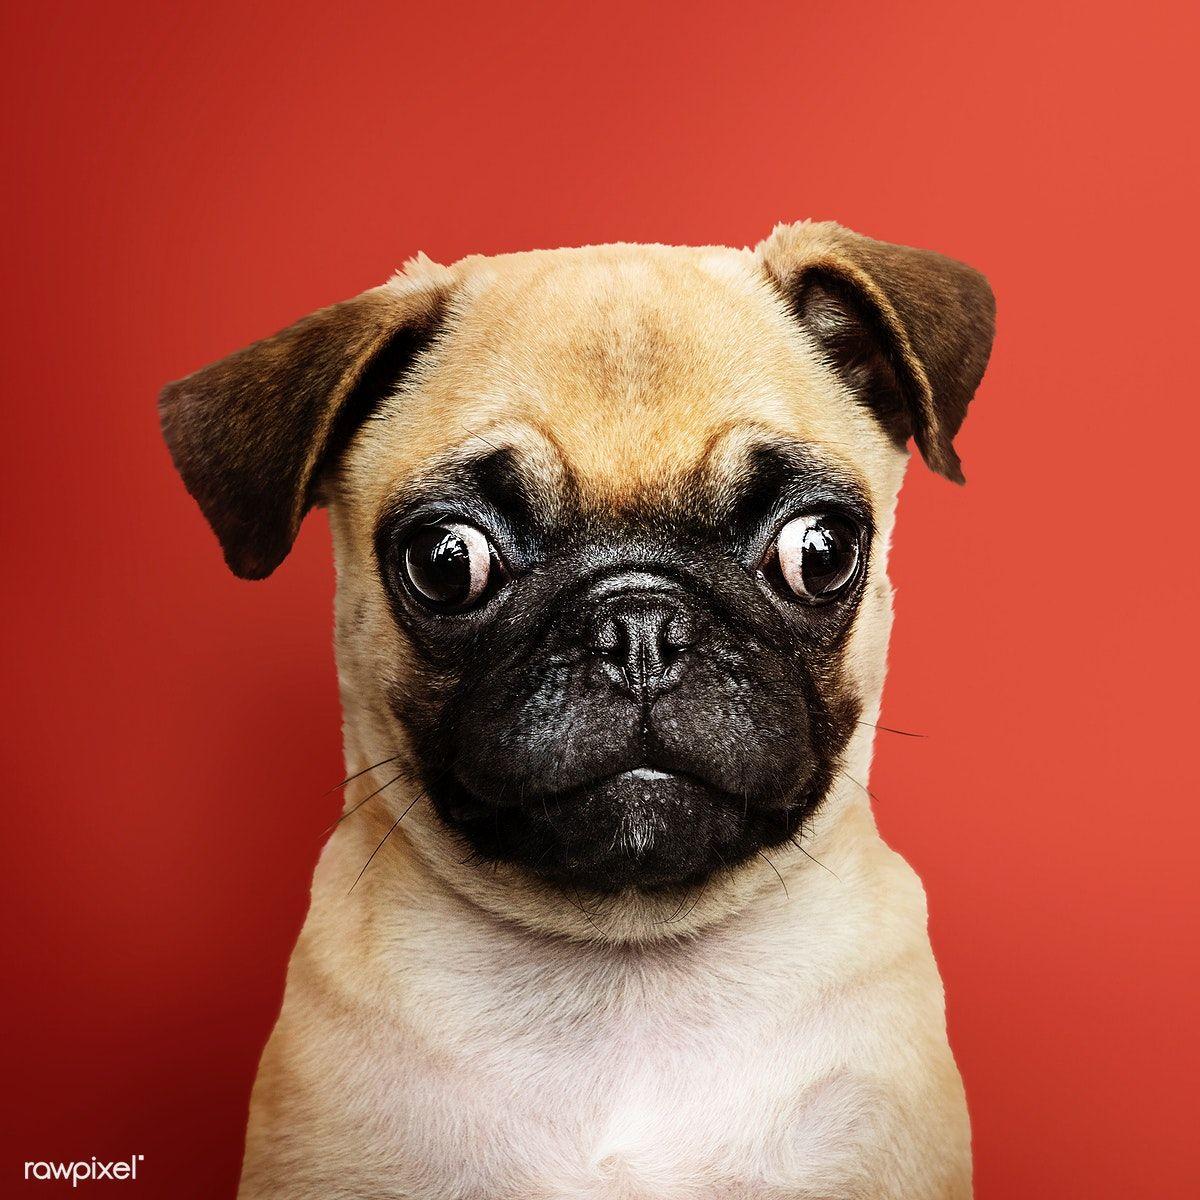 Download premium image of adorable pug puppy solo portrait